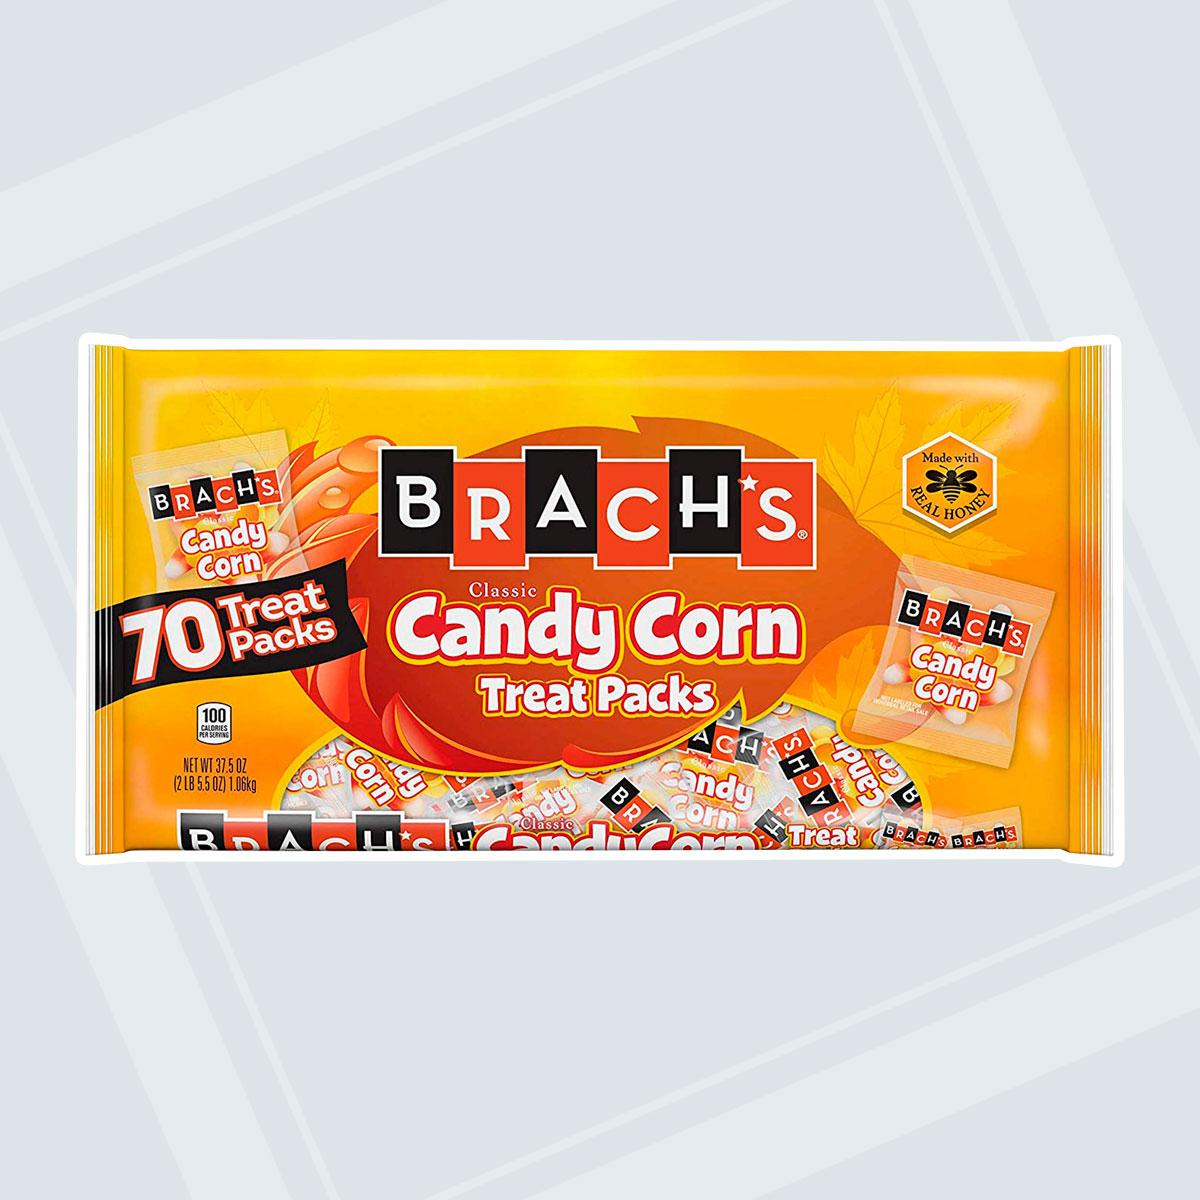 Конфеты Brach's Candy Corn 1,06 kg